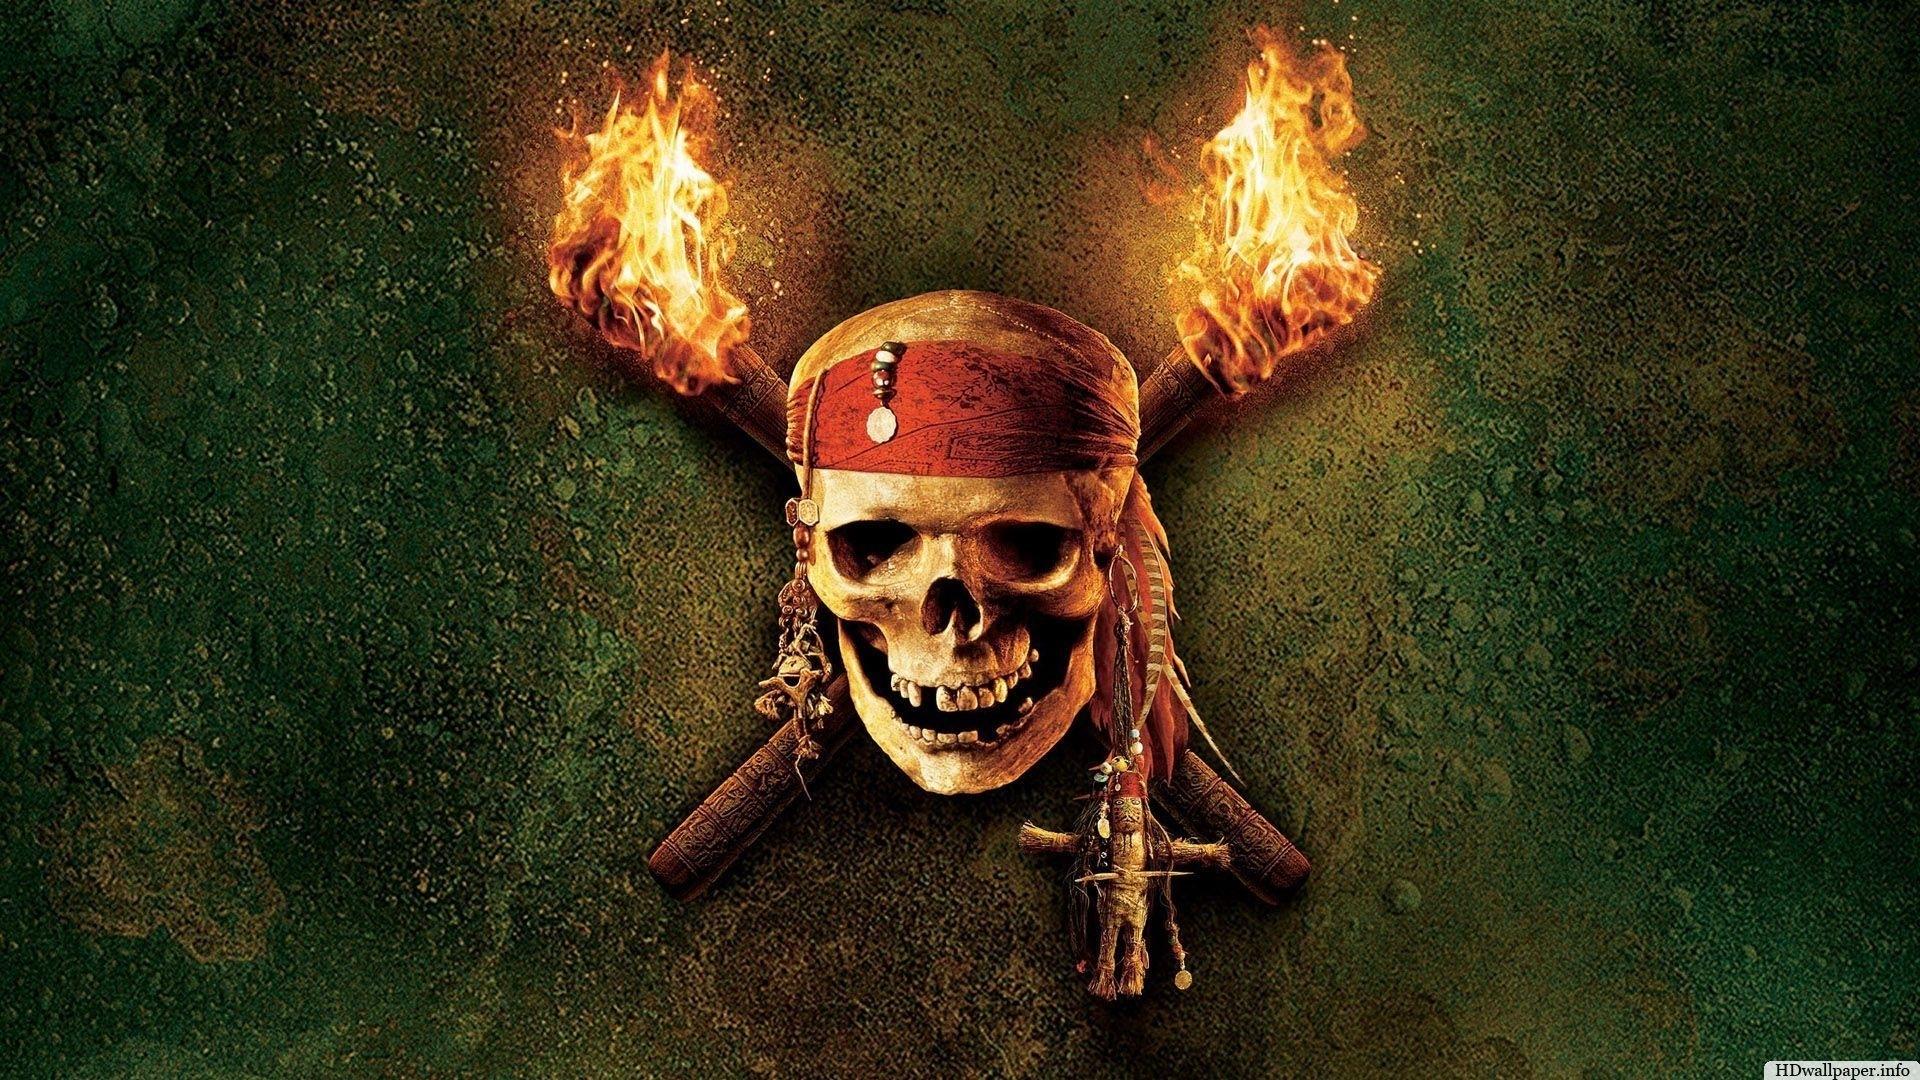 pirates of the caribbean wallpaper hd 1920x1080 - http://hdwallpaper